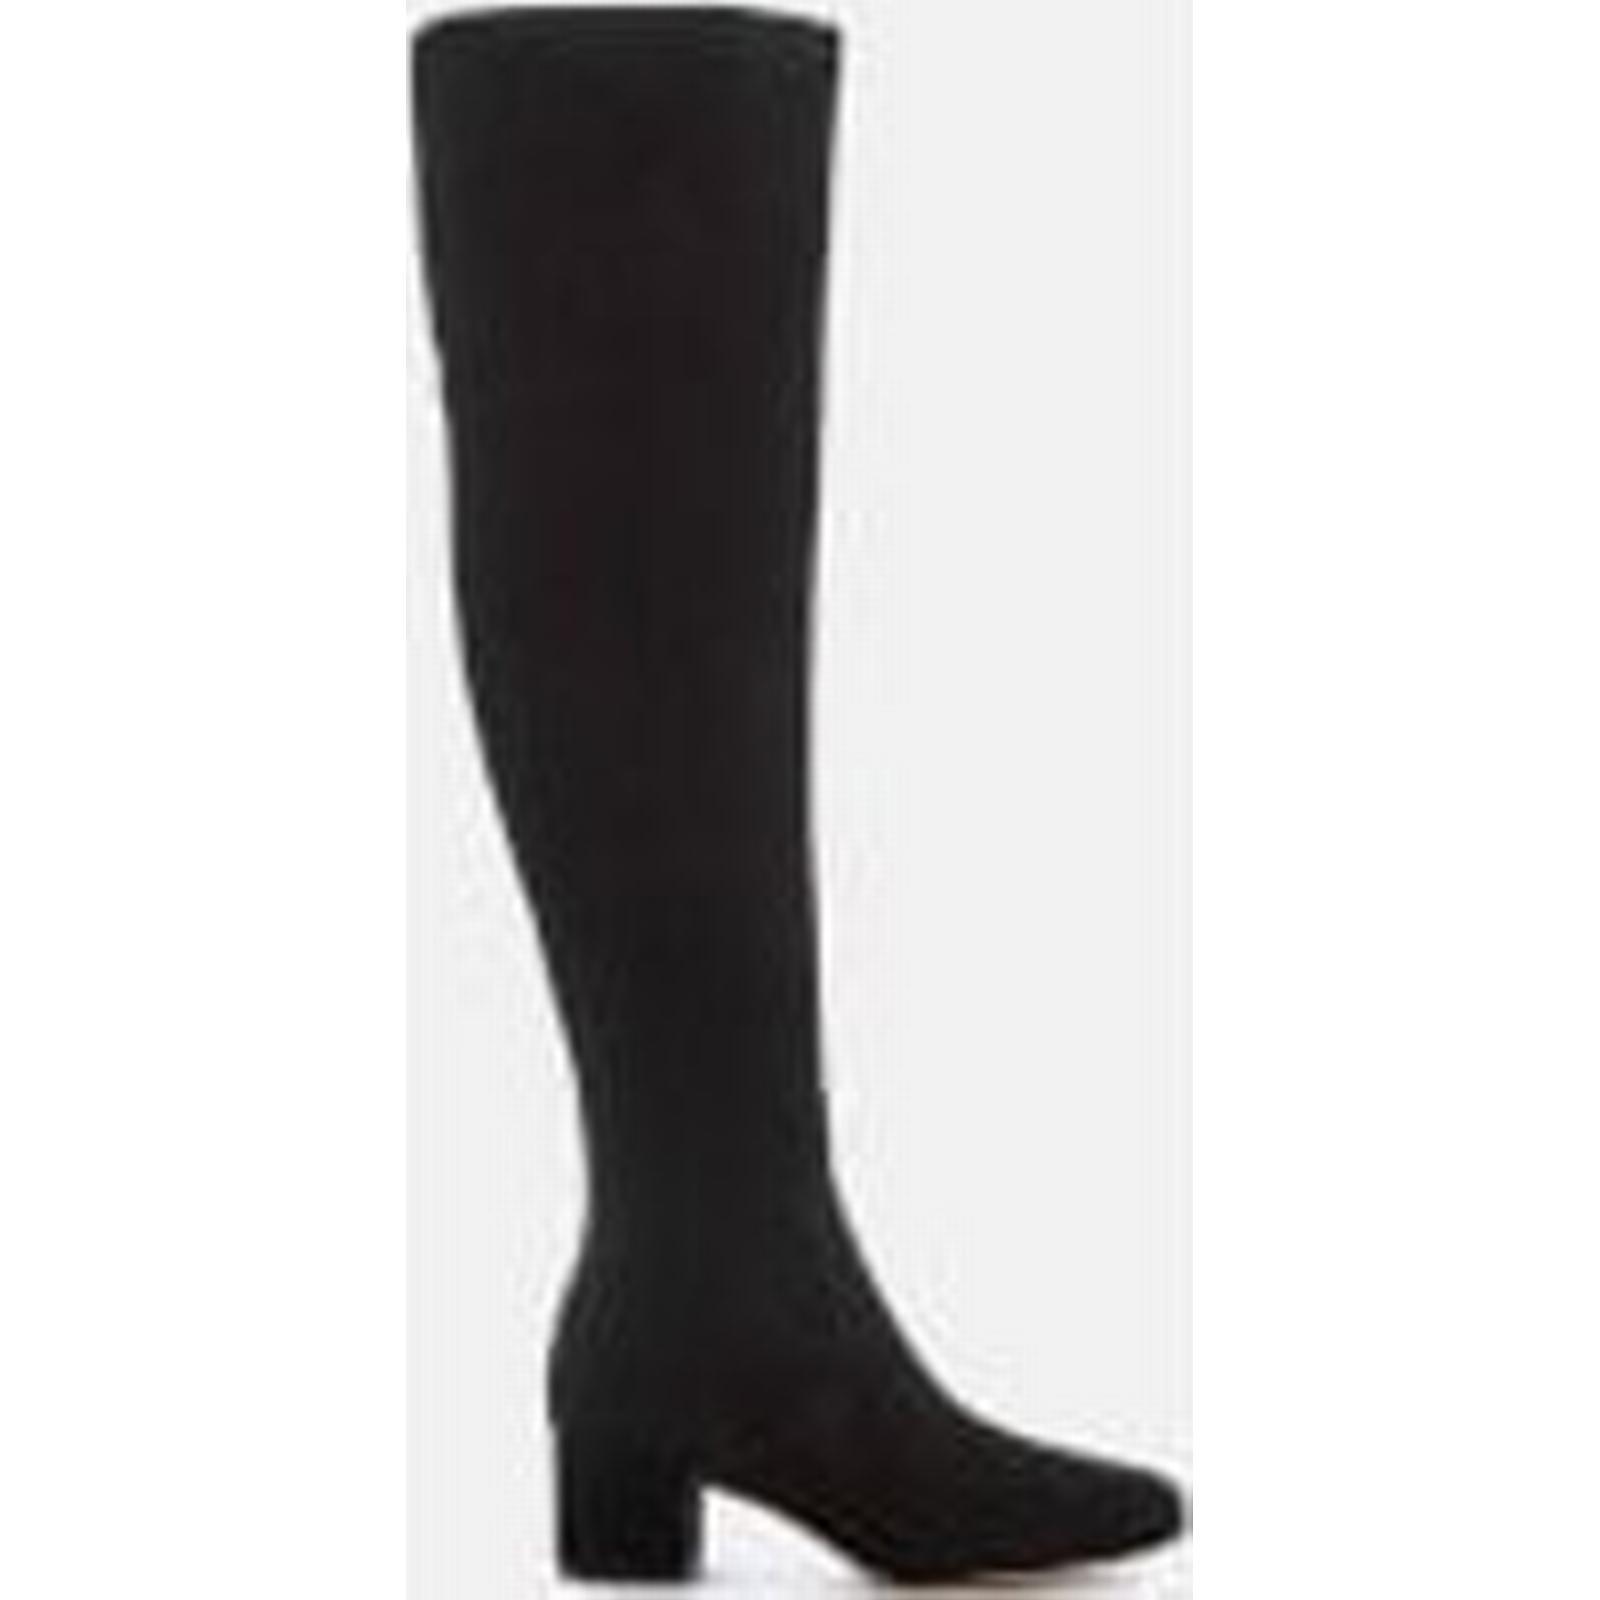 Sam Thigh Edelman Women's Elina Suede Thigh Sam High Boots - Black c40daa